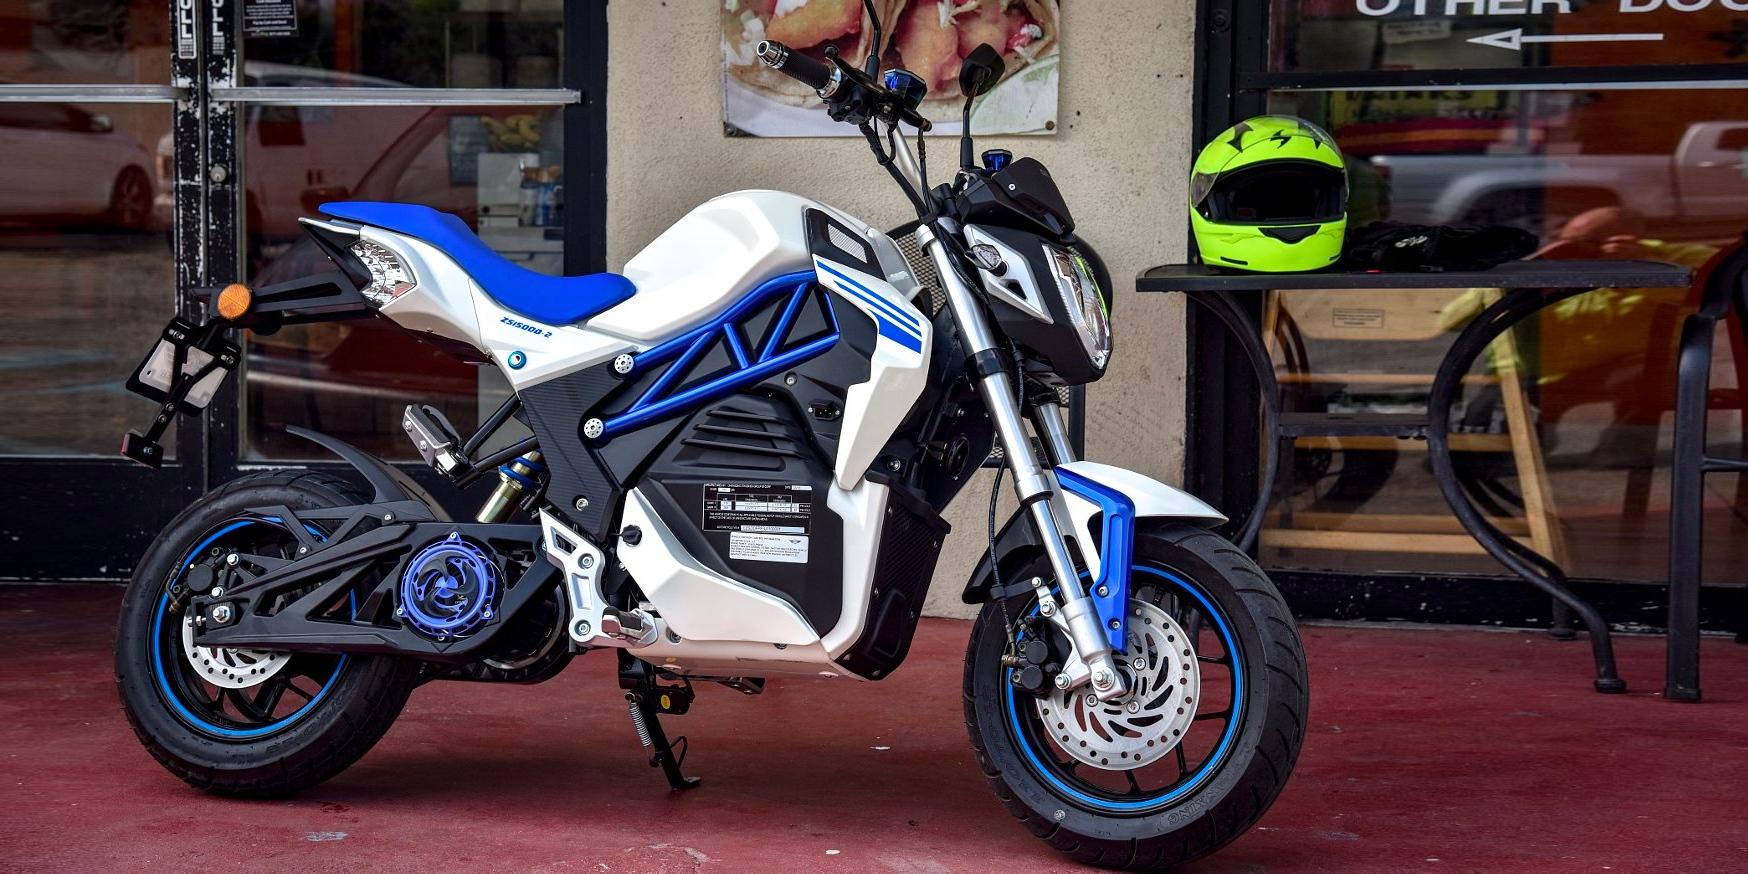 CSC Motorcycles